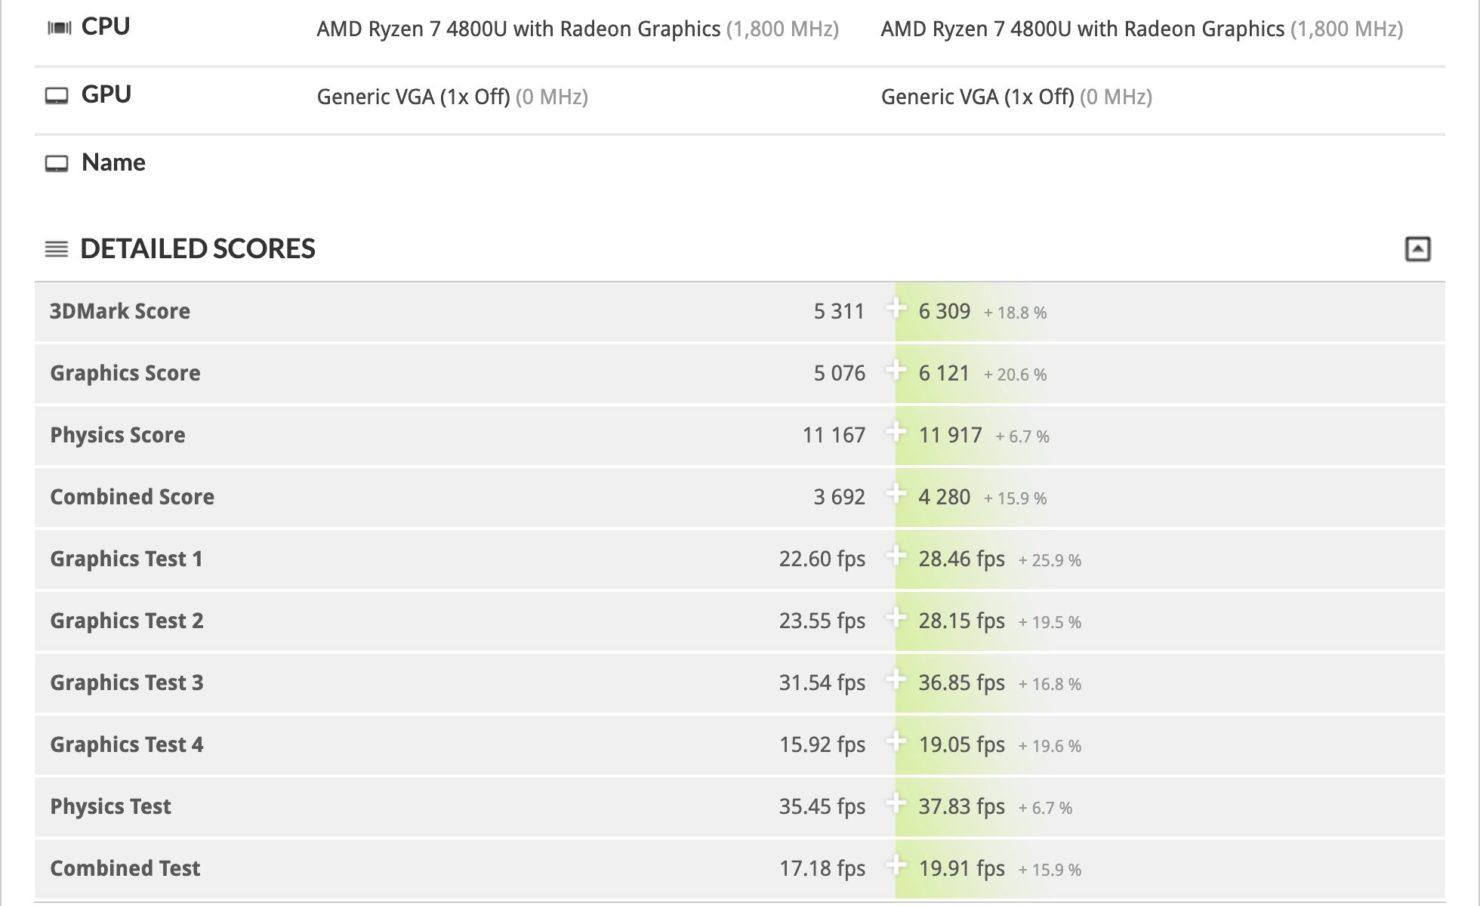 AMD Ryzen 7 4800U de 15 vatios Vs AMD Ryzen 7 4800U de 25 vatios